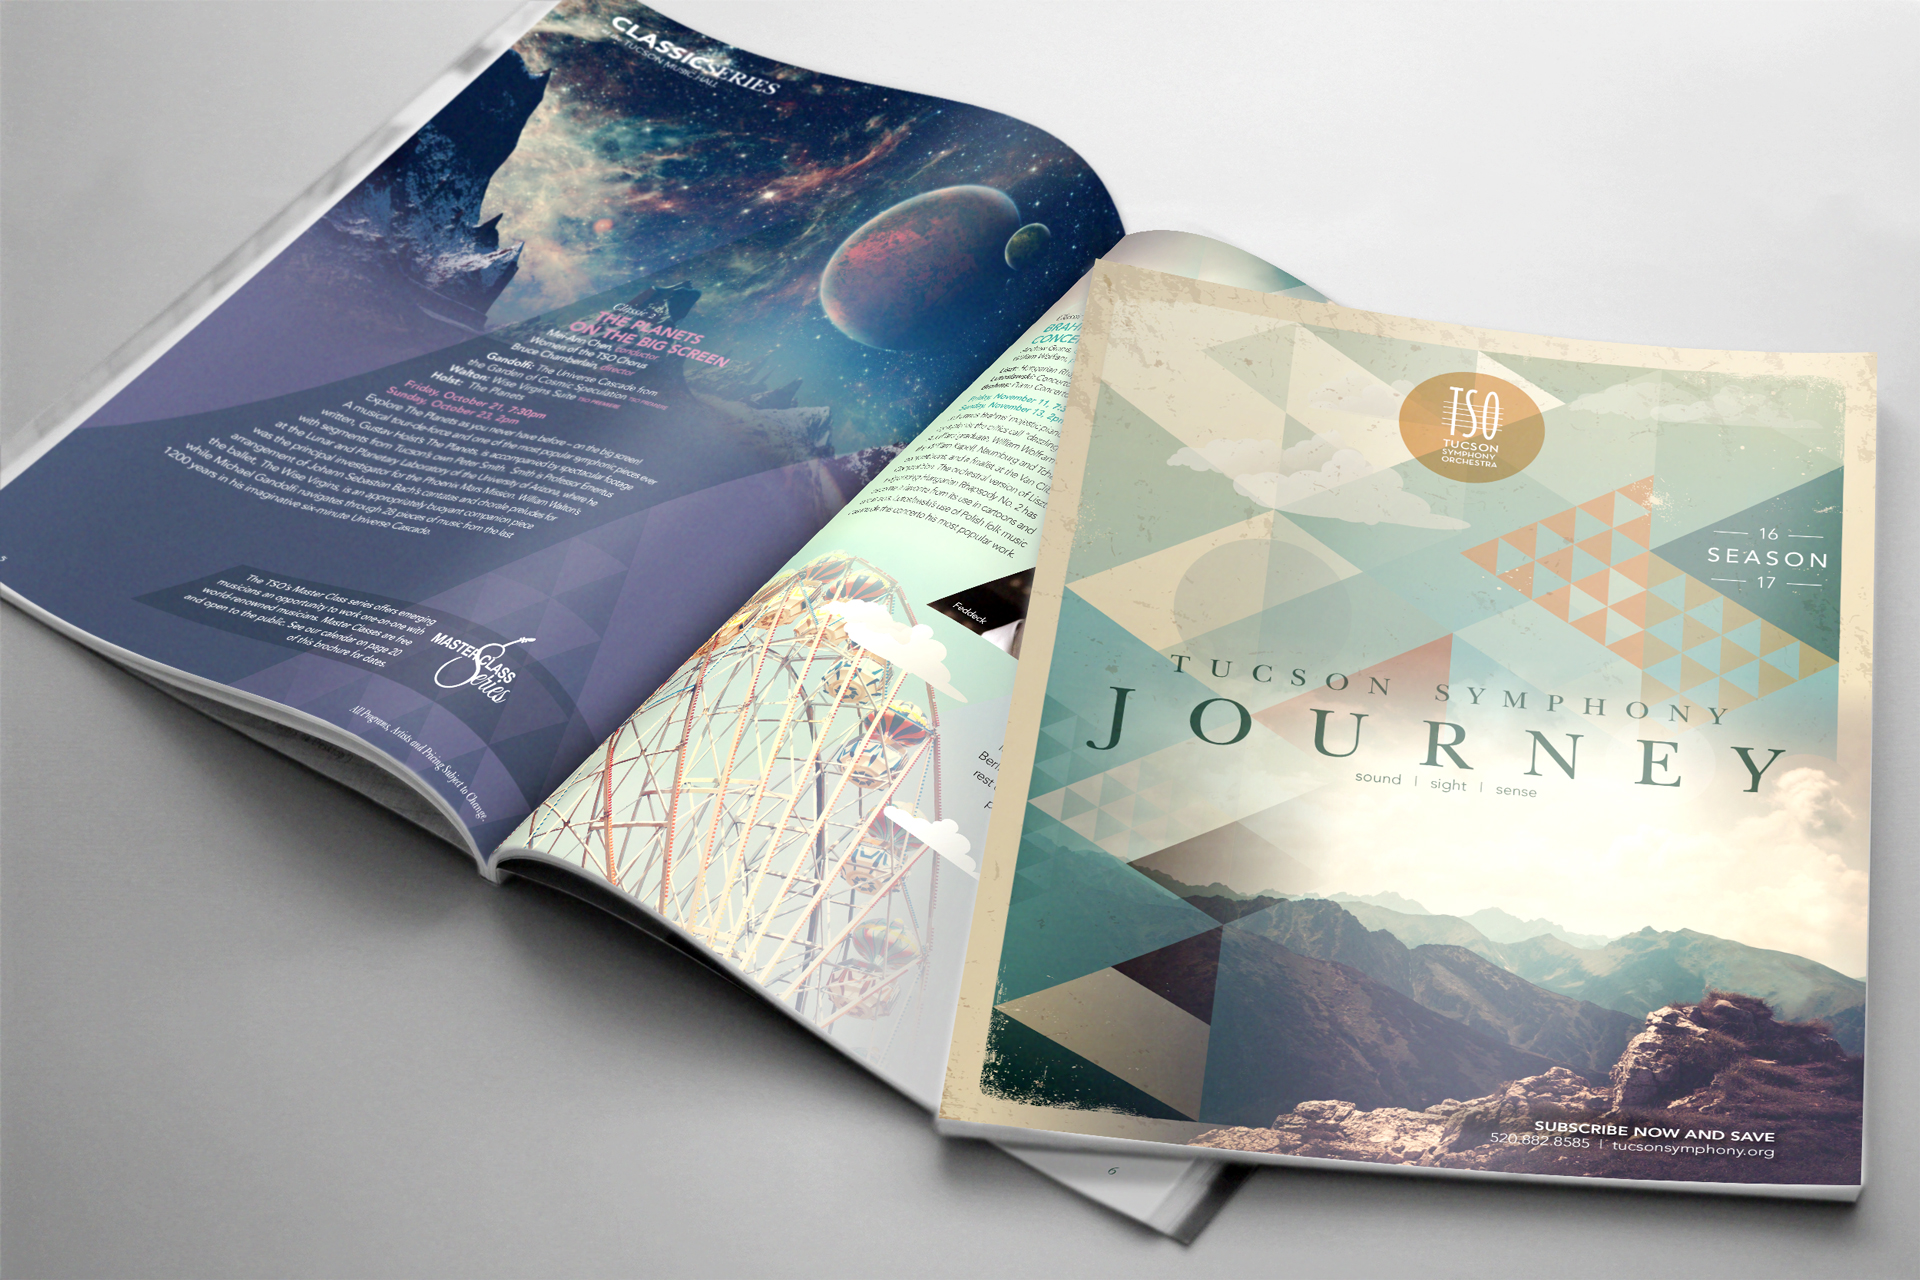 Tucson Symphony Orchestra • 2016 Brochure Cover Design